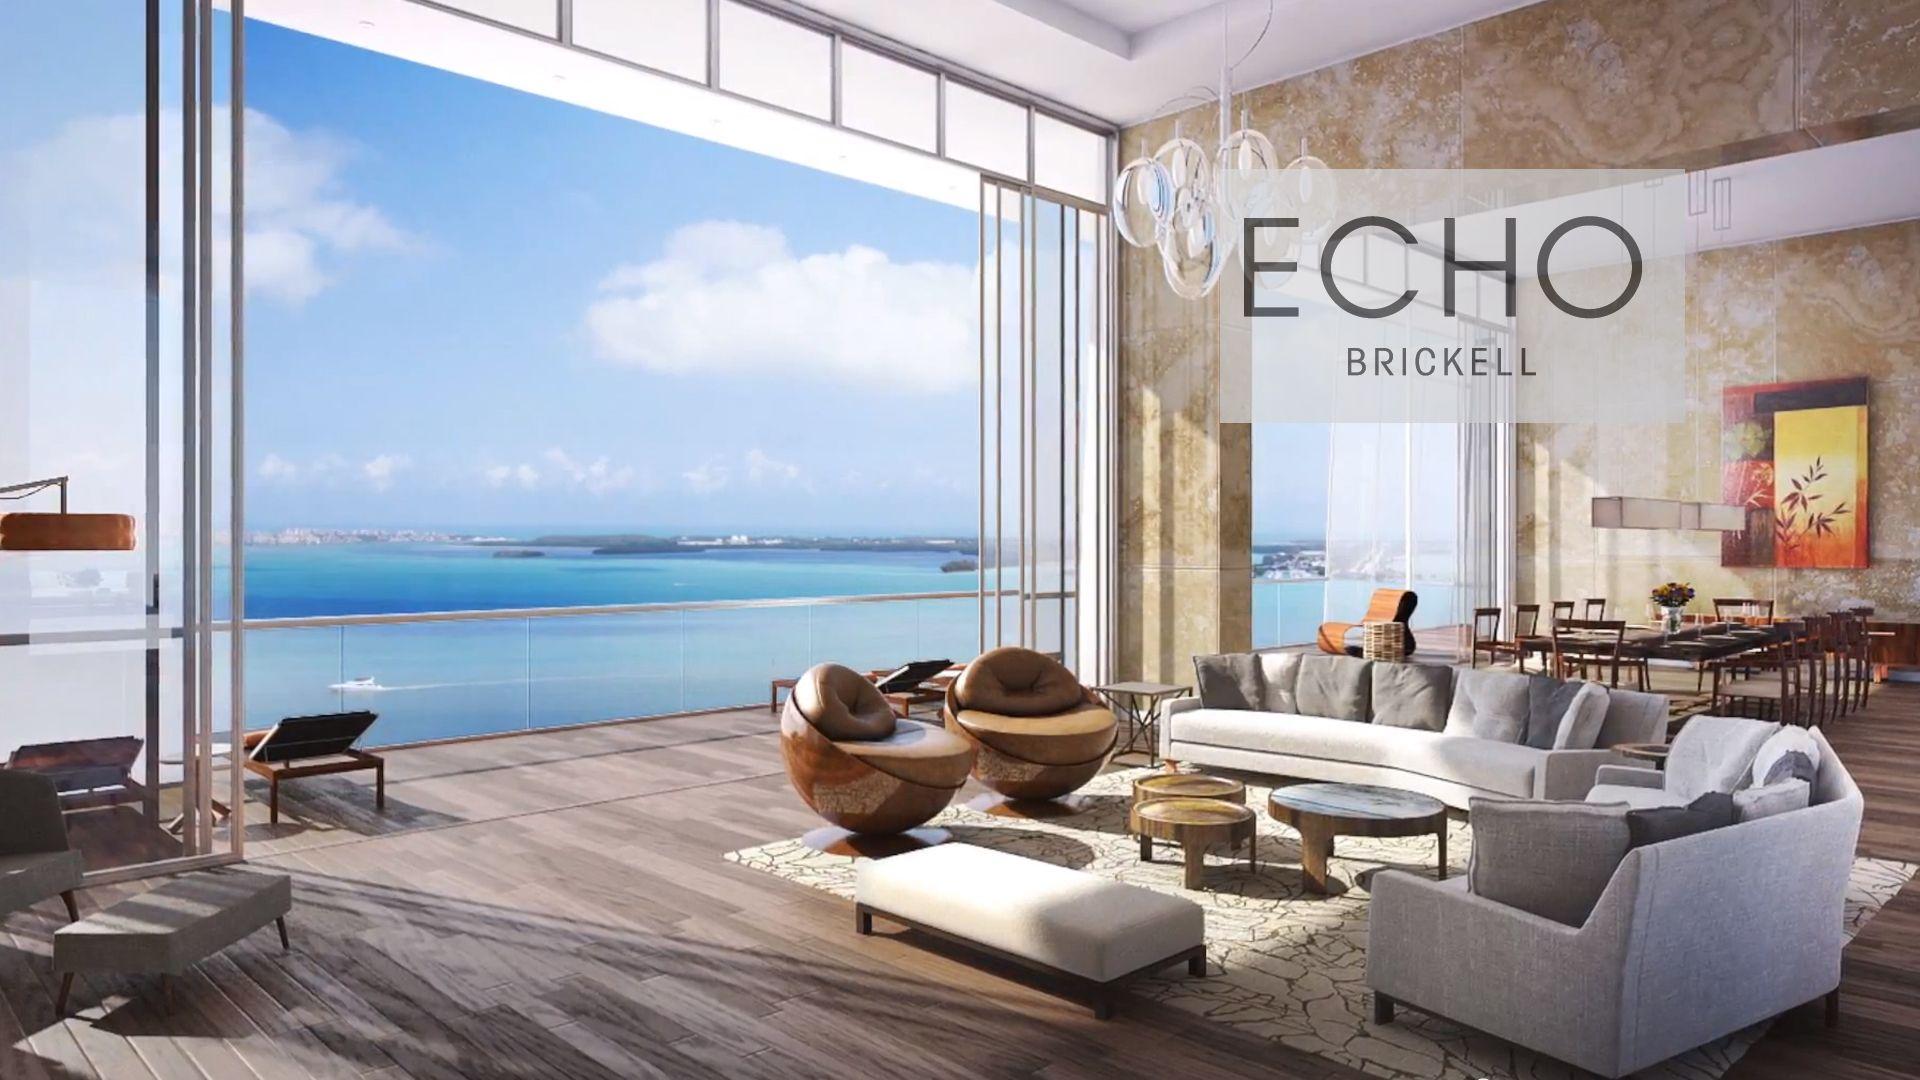 Echo Brickell Floor Plans Echo Brickell Is The Second Ultra Luxury Condo Residences